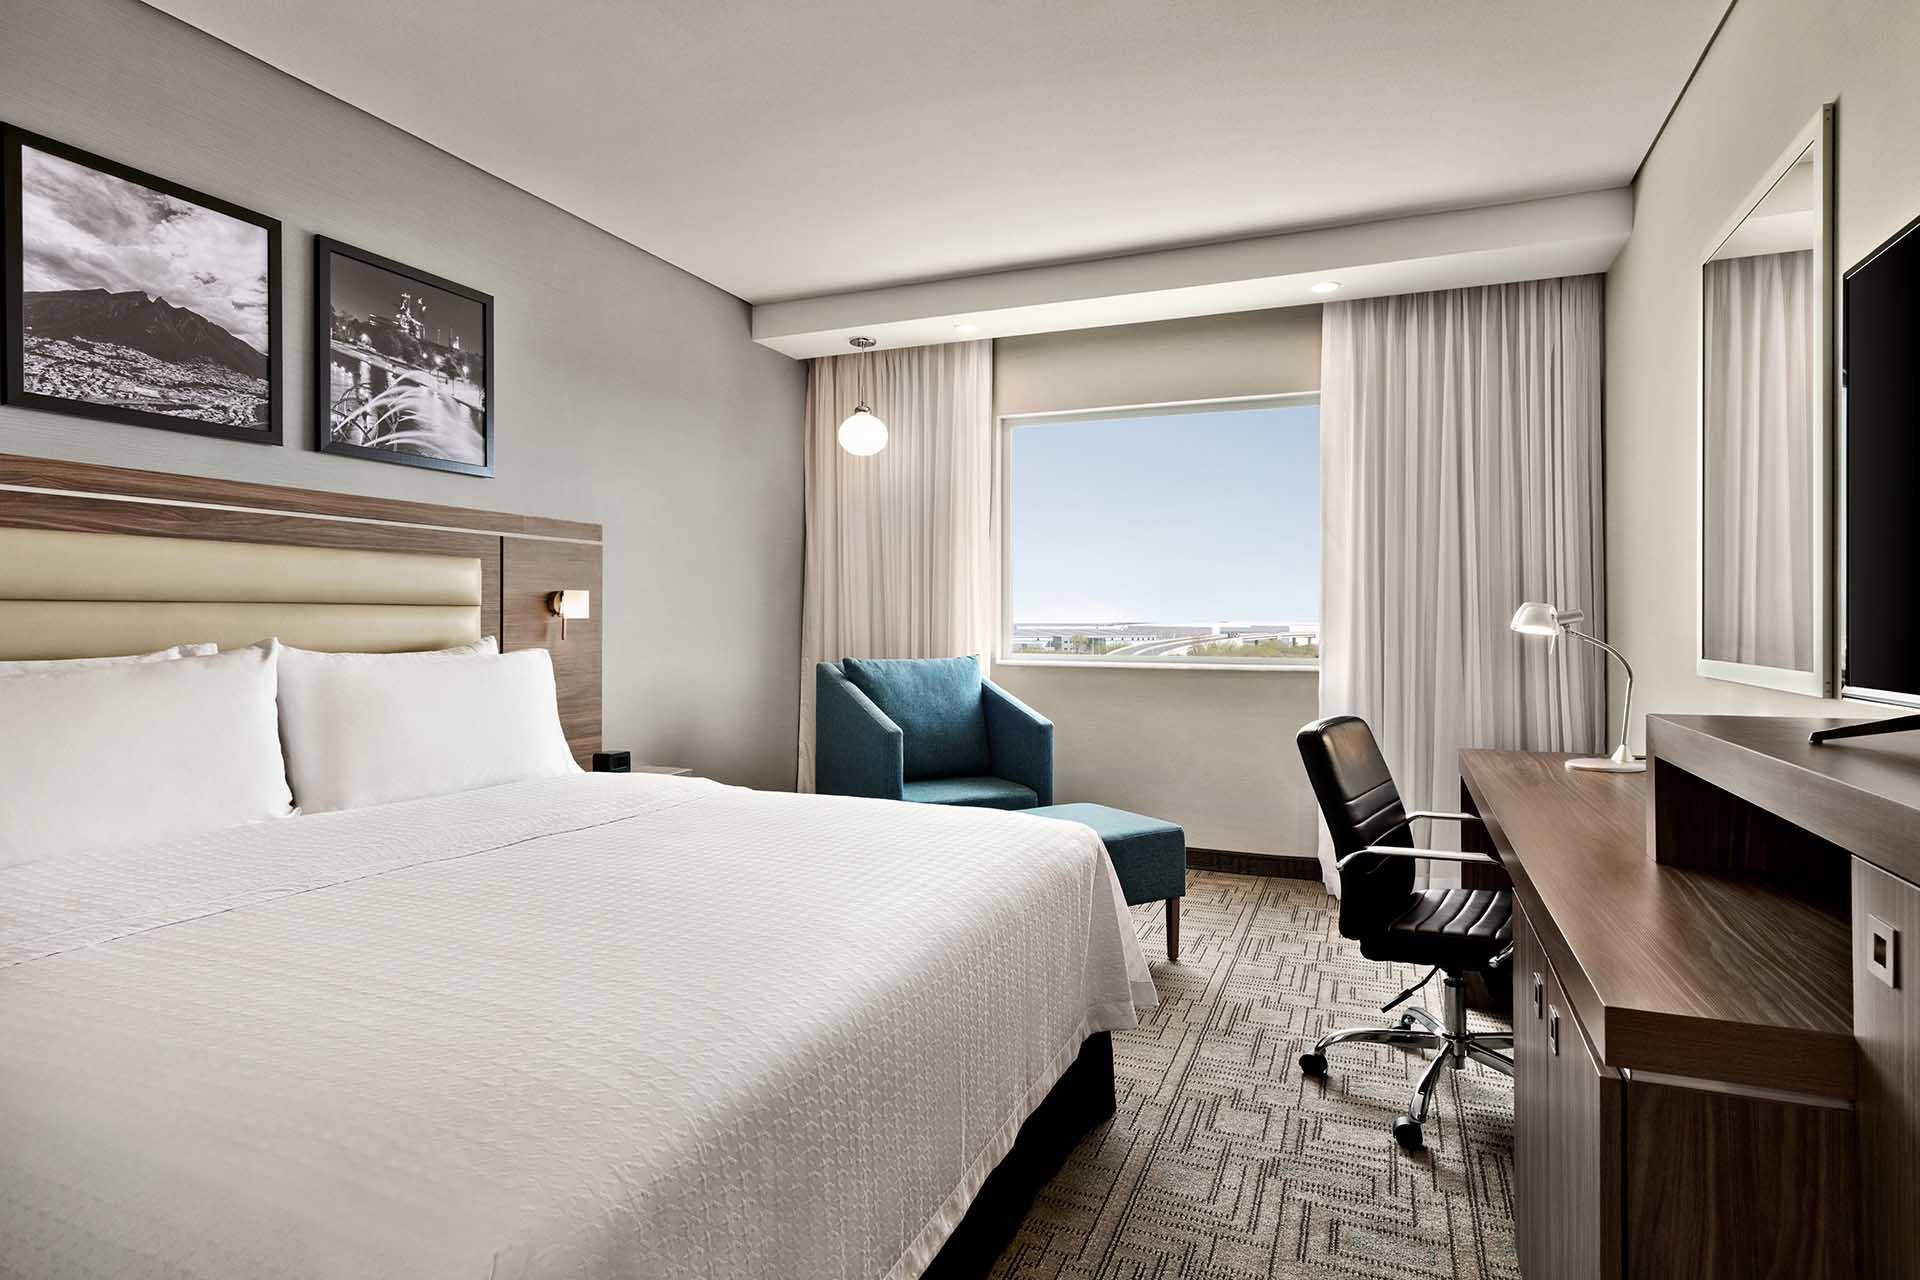 Hotels homewood suites generic